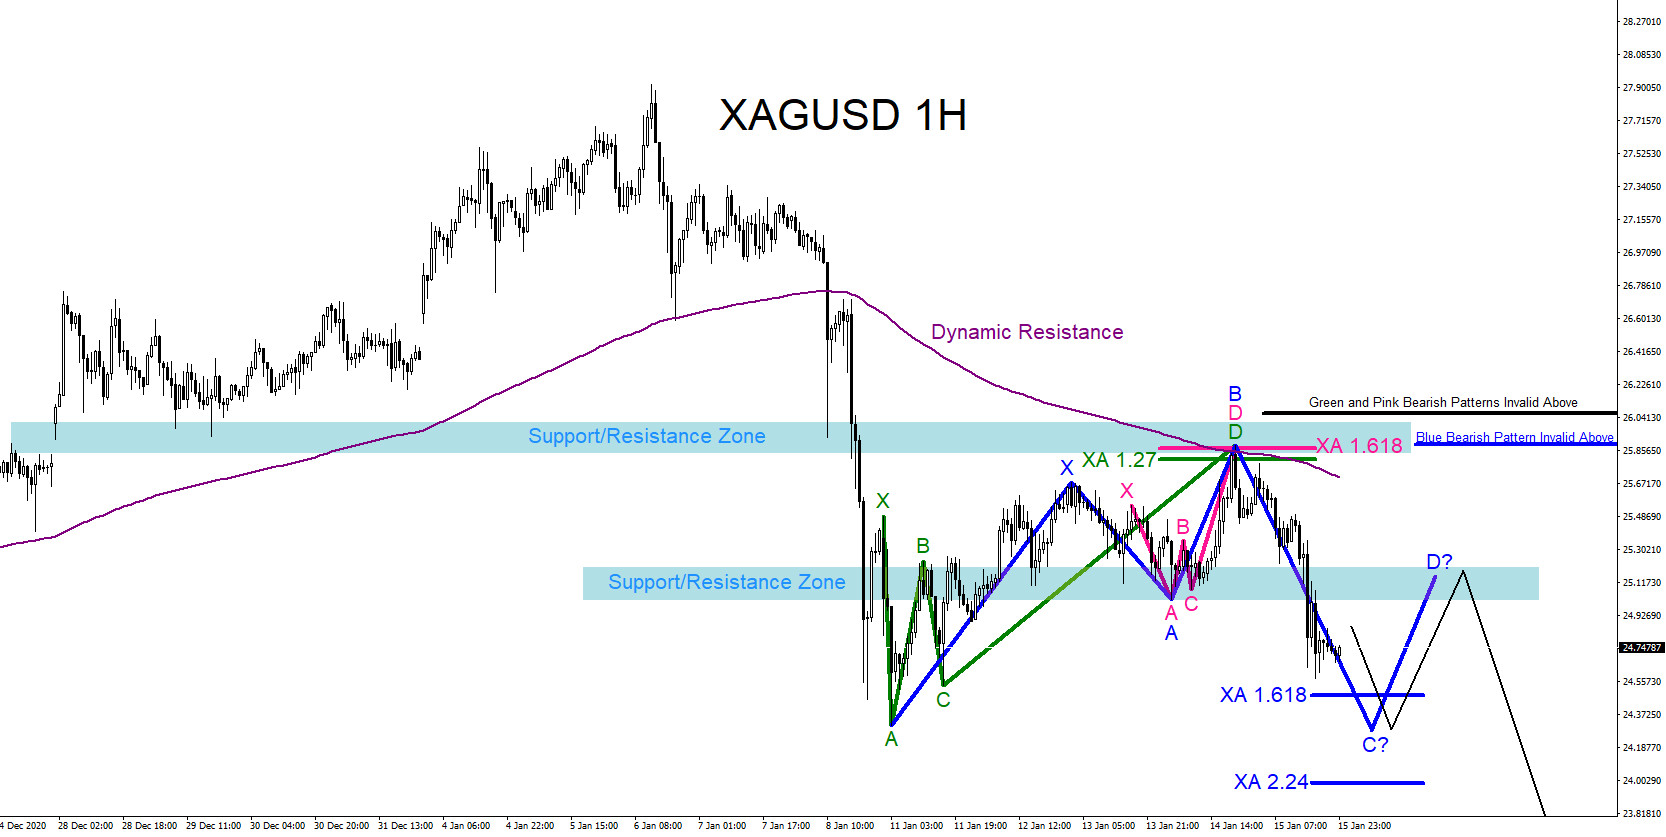 XAGUSD : Market Patterns Signalling More Downside